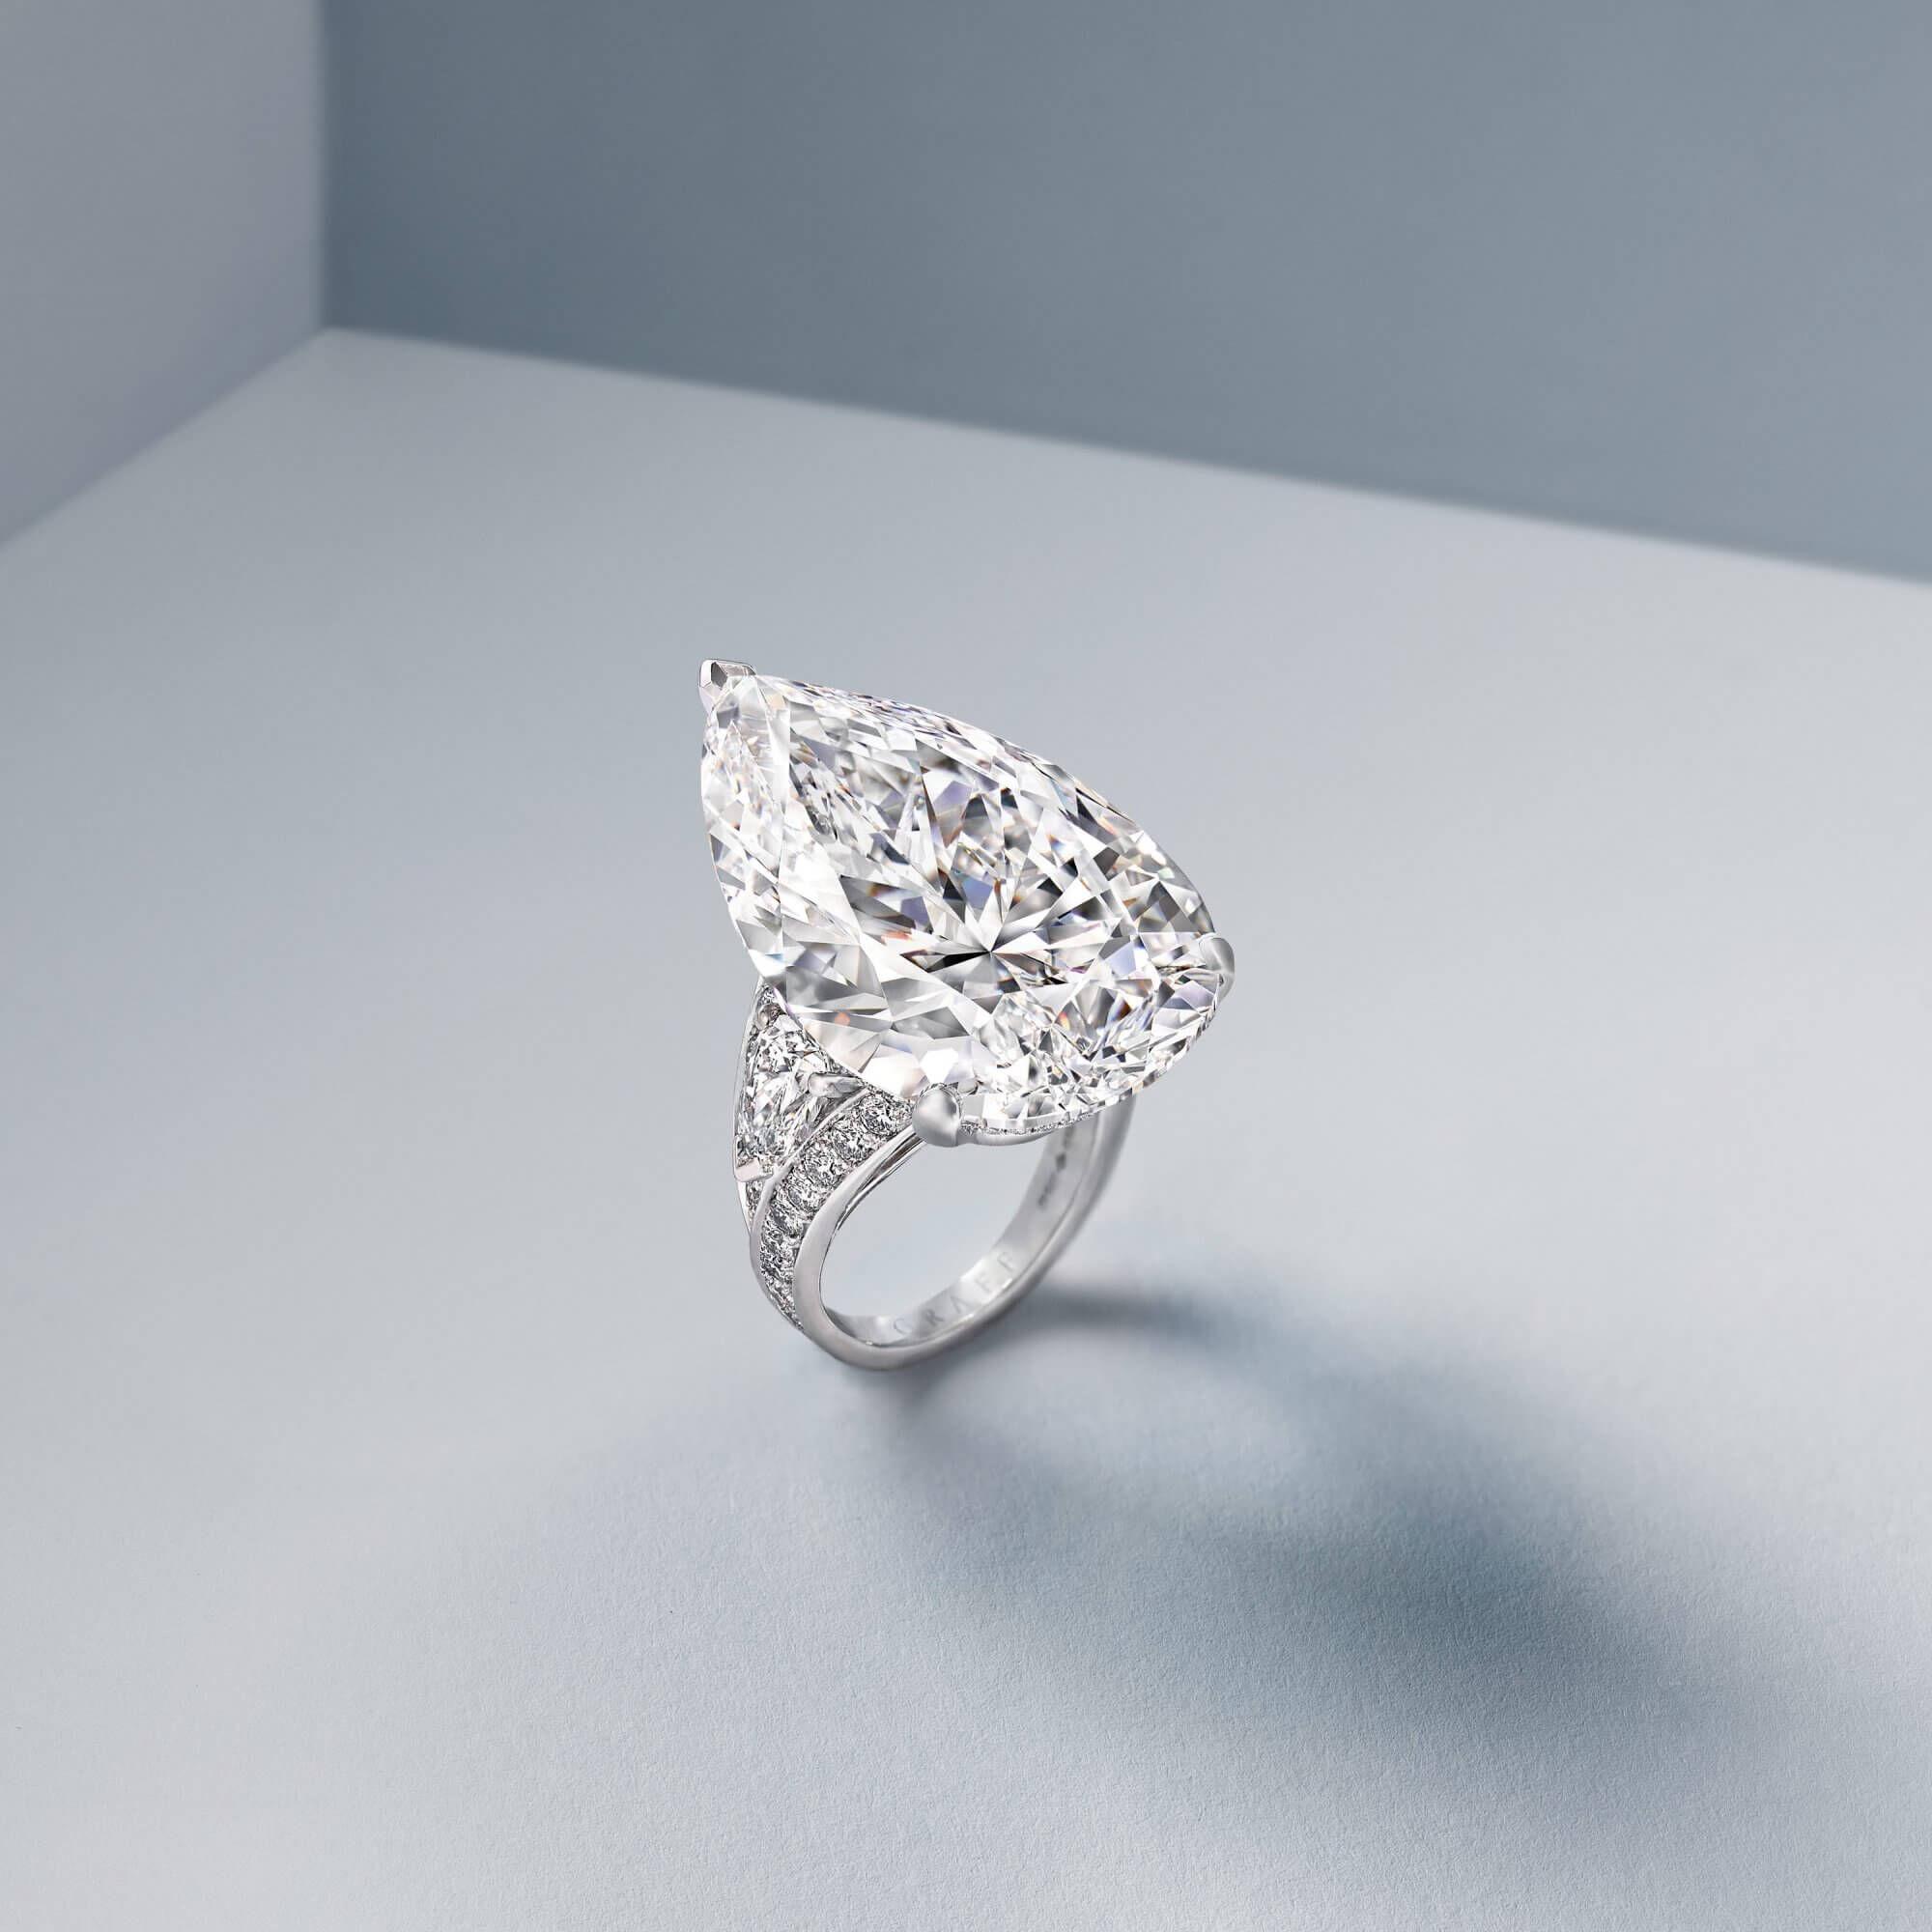 Graff Diamond Majesty a 38.13 carat D Flawless pear shape diamond ring